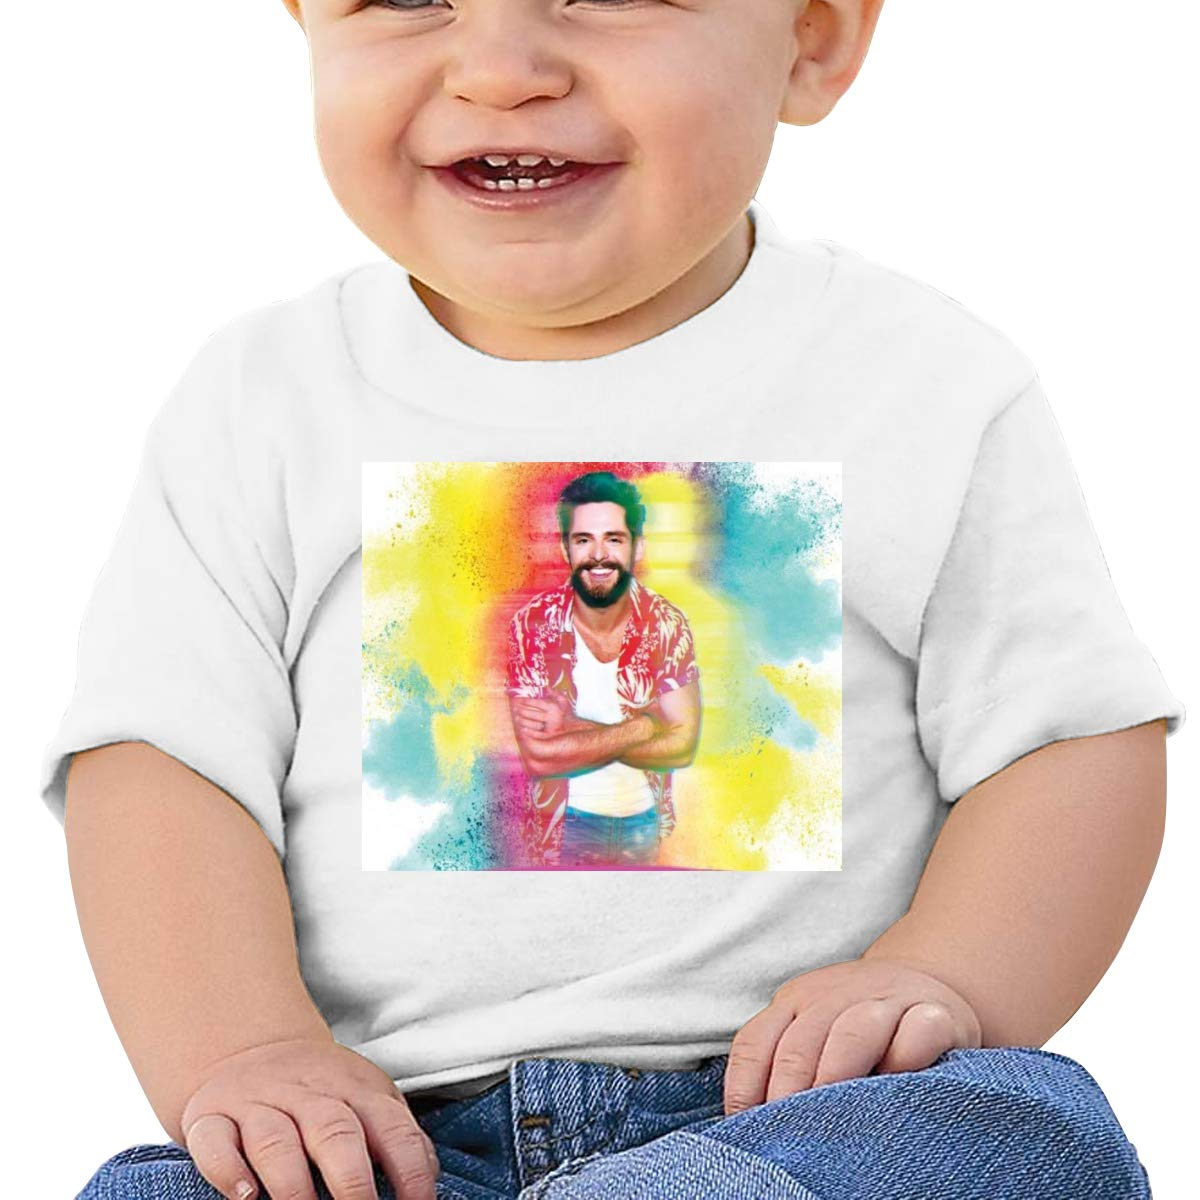 Kangtians Baby Thomas Rhett Short Sleeve Shirt Toddler Tee